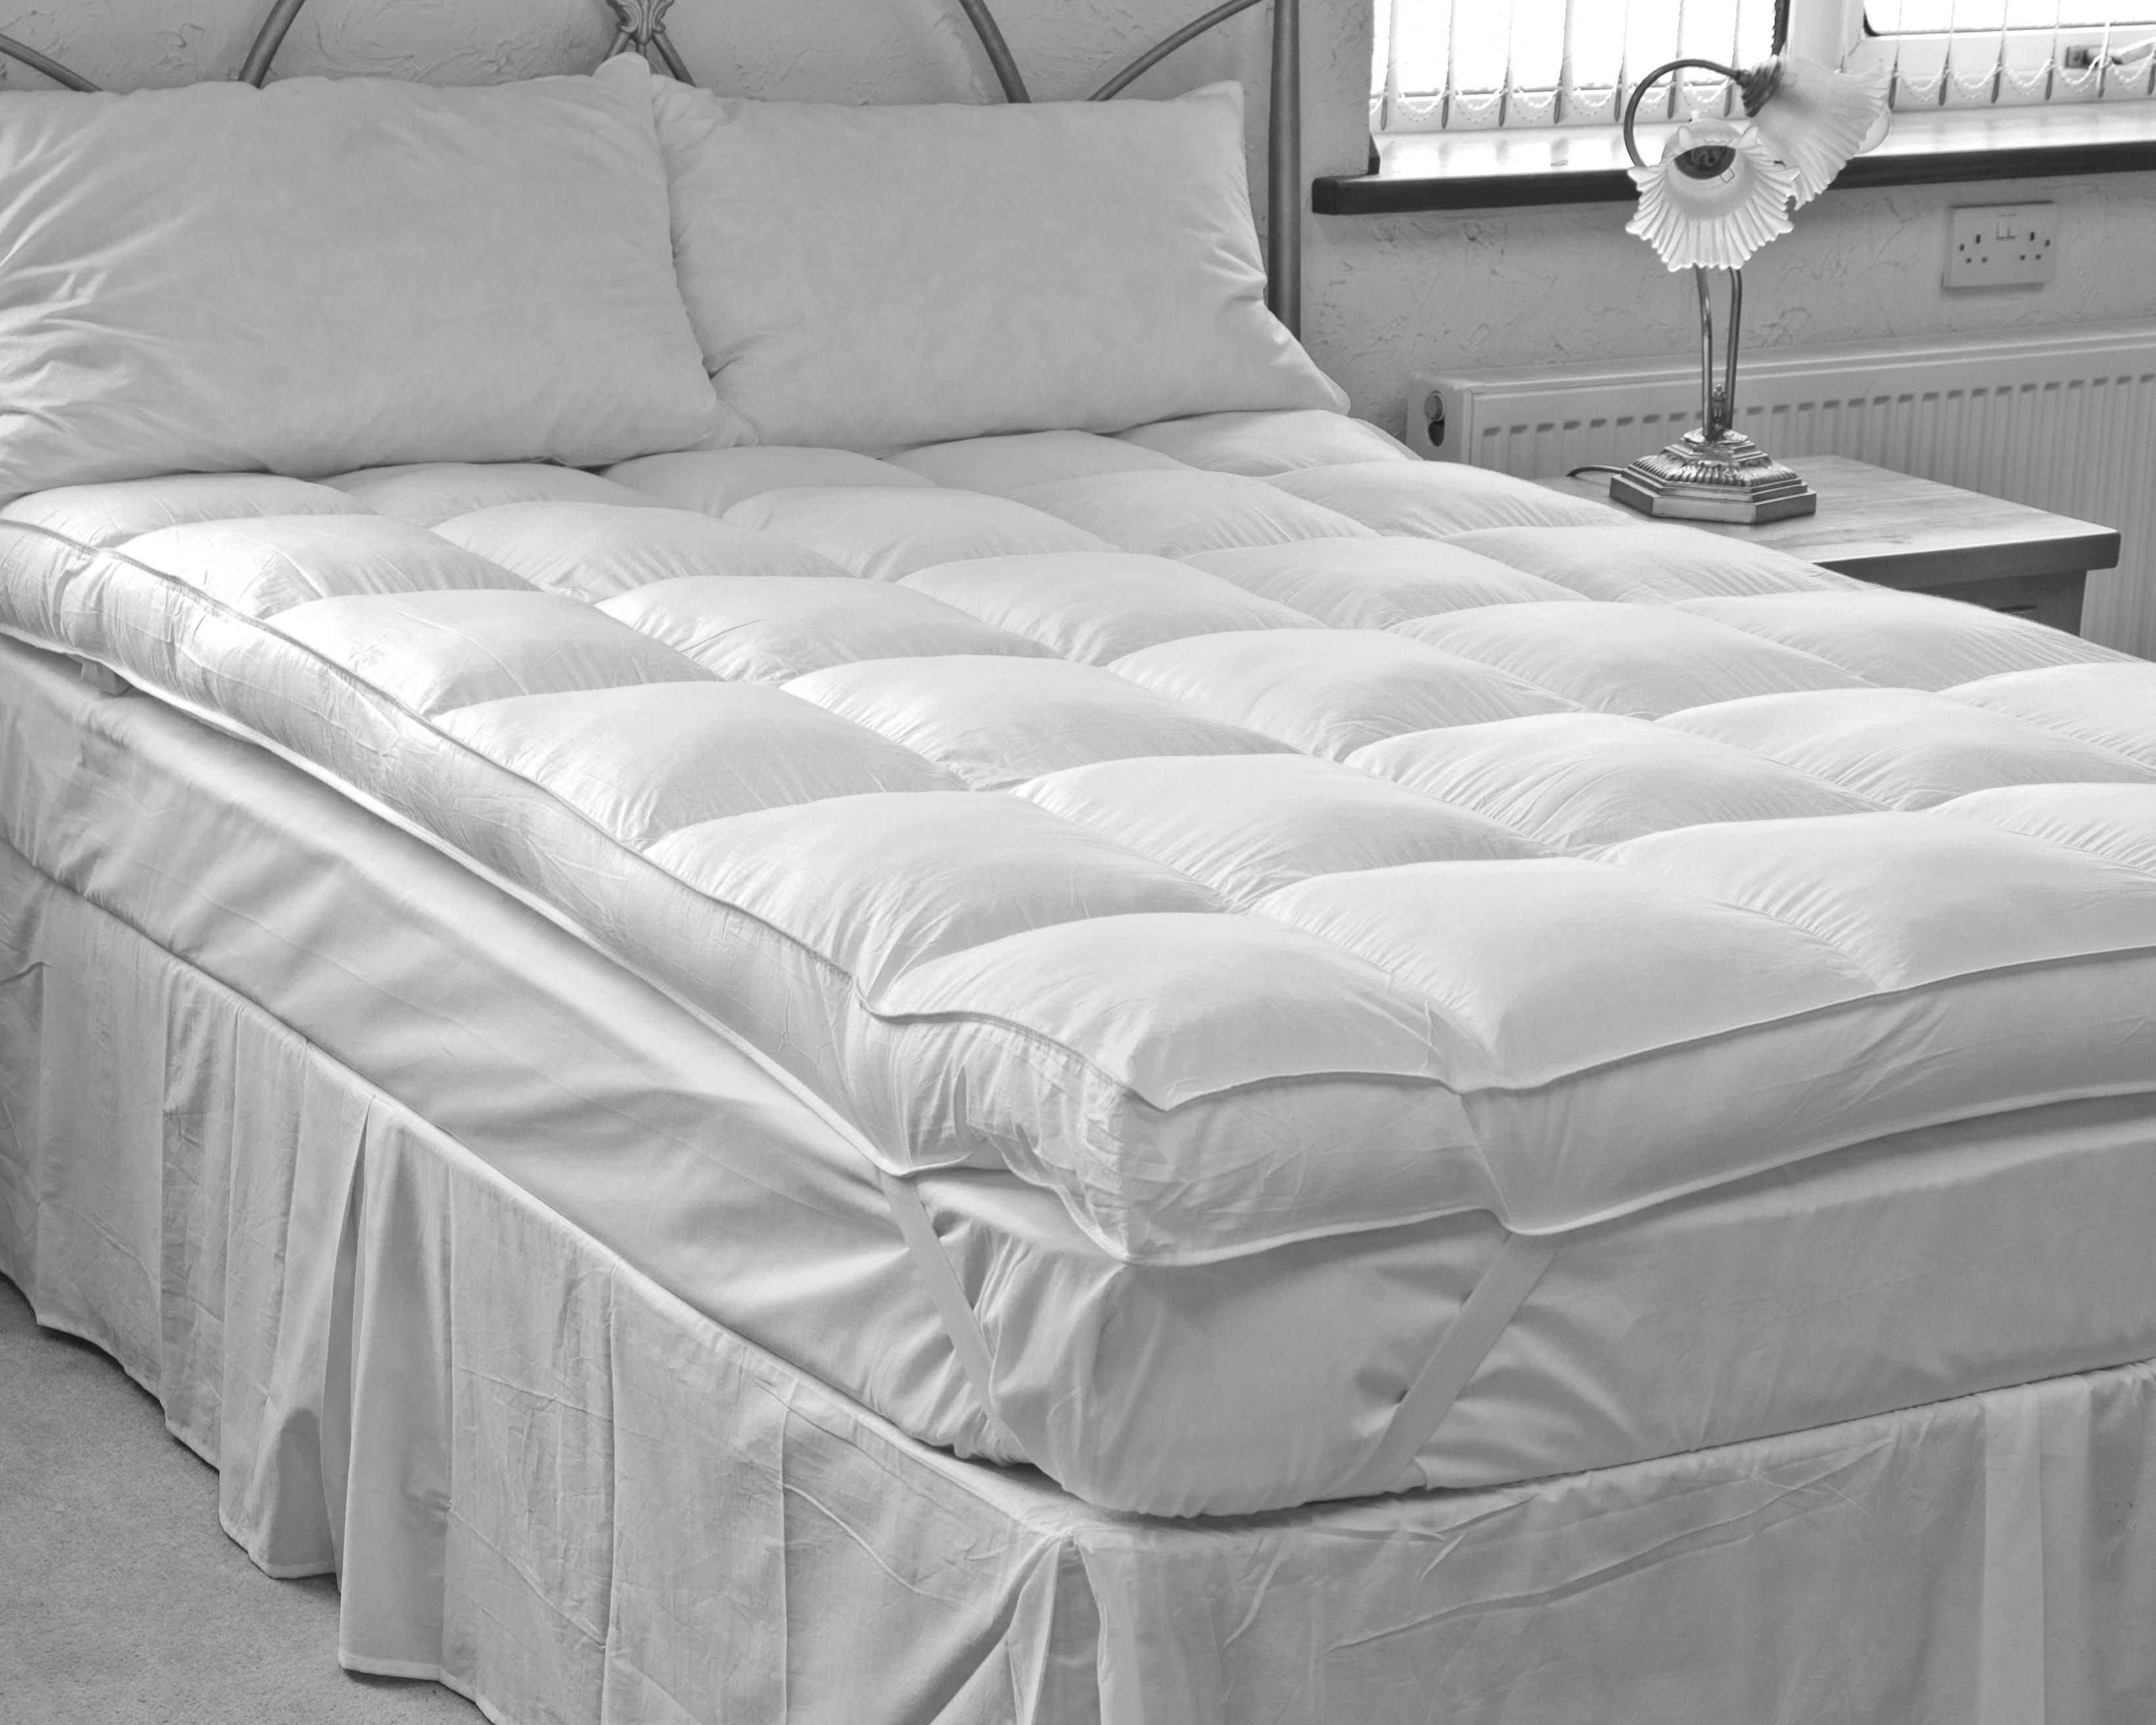 thick mattress topper. Hotel-Quality-Slight-Seconds-4-inch-Thick-Extra- Thick Mattress Topper A